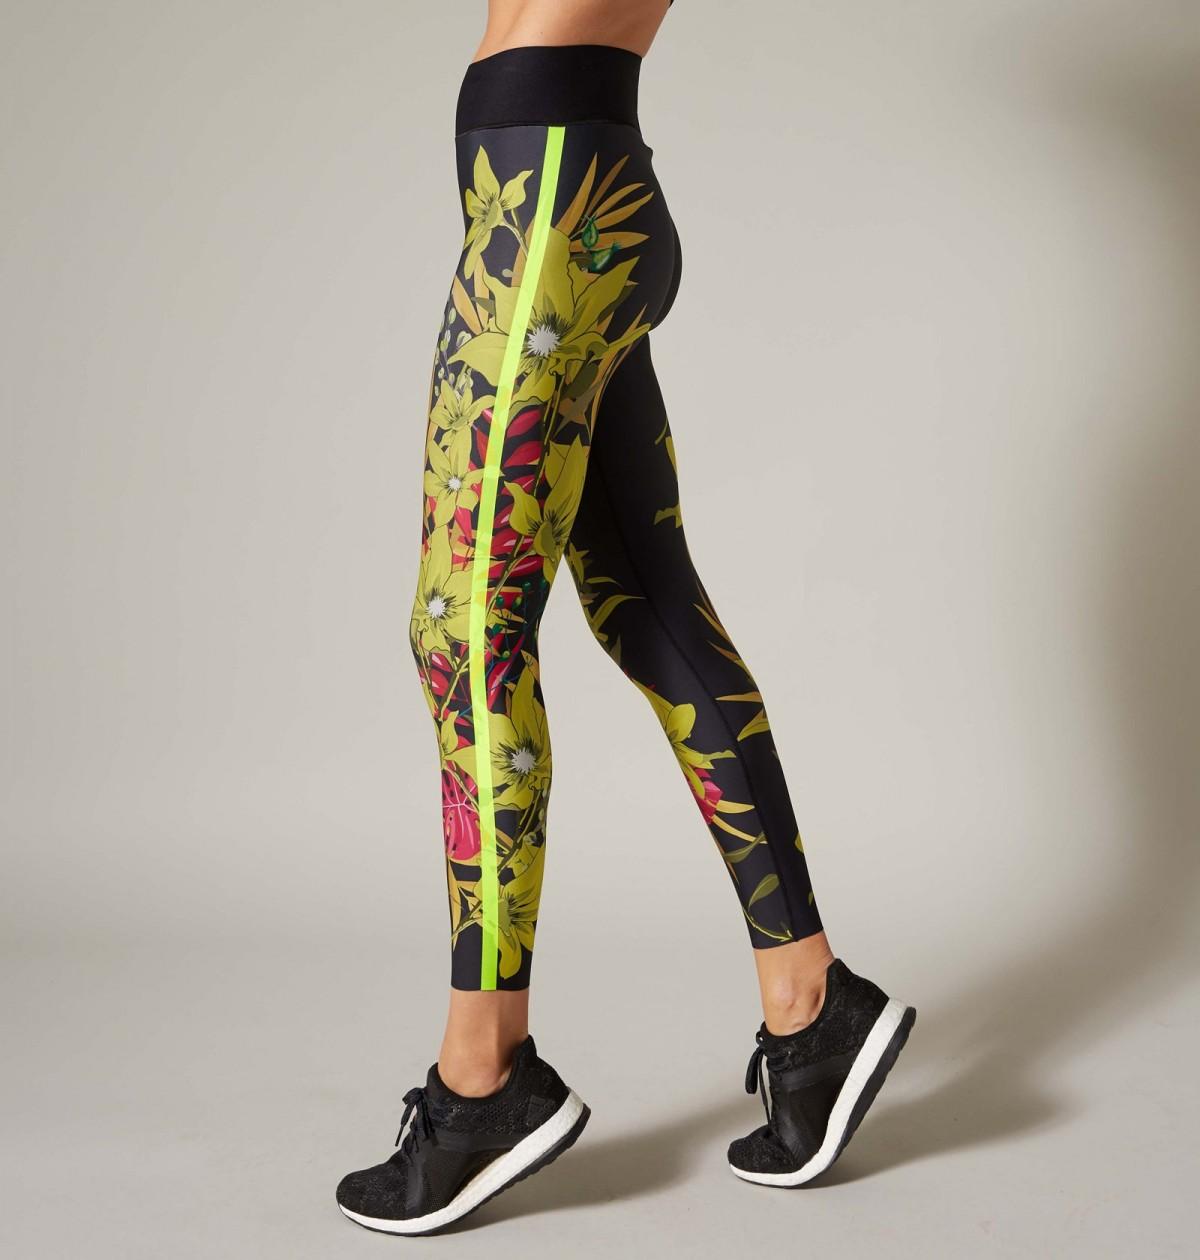 Lemon Print and Neon Green Bouquet Legging